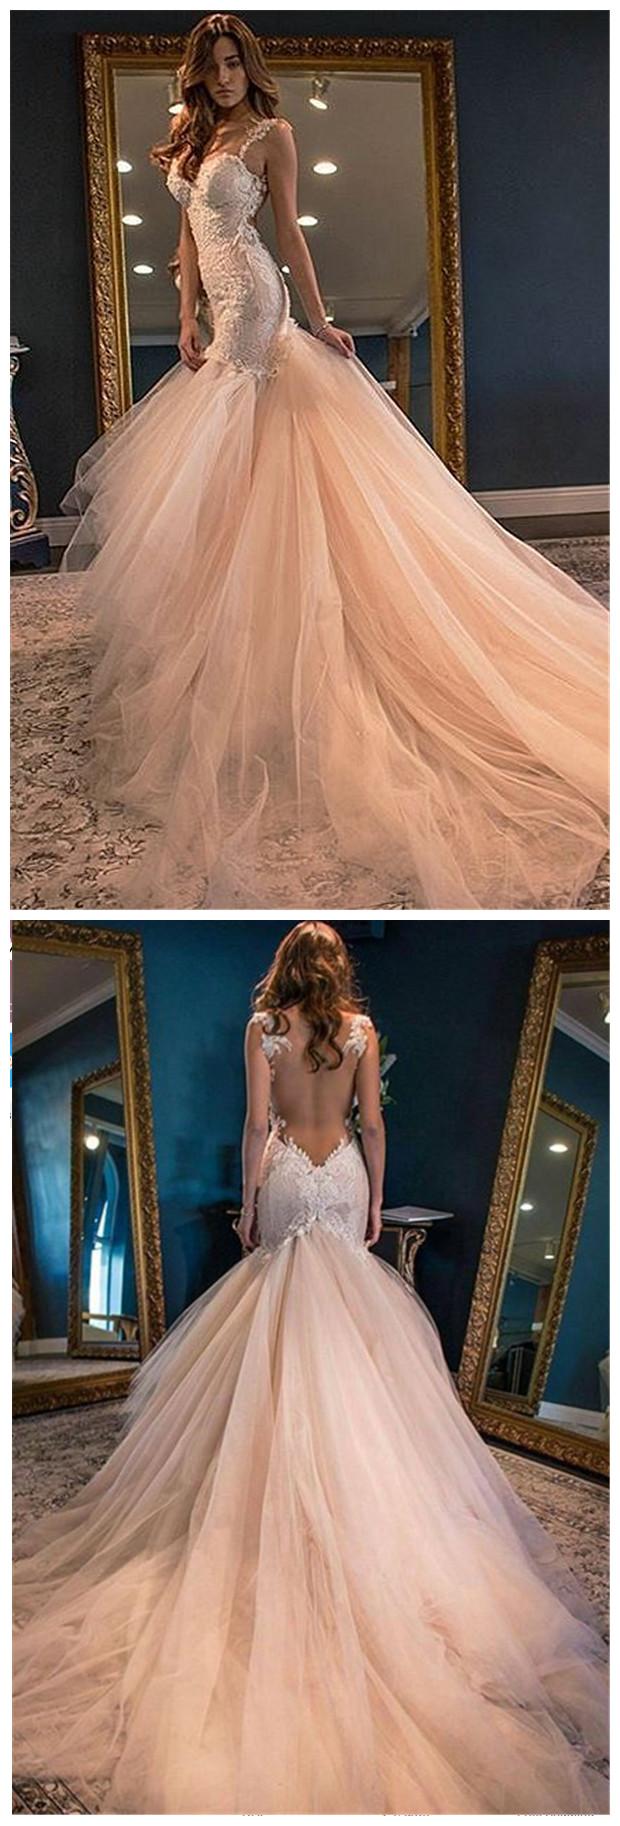 Glamorous_Sleeveless_Lace_Appliques_Wedding_Dress_Mermaid_Tulle_bridal_dresses_wedding_gowns